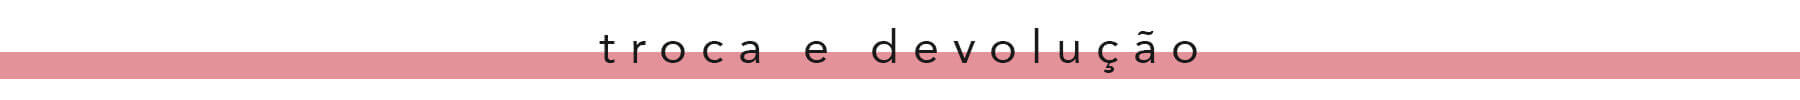 banner condicoes 2